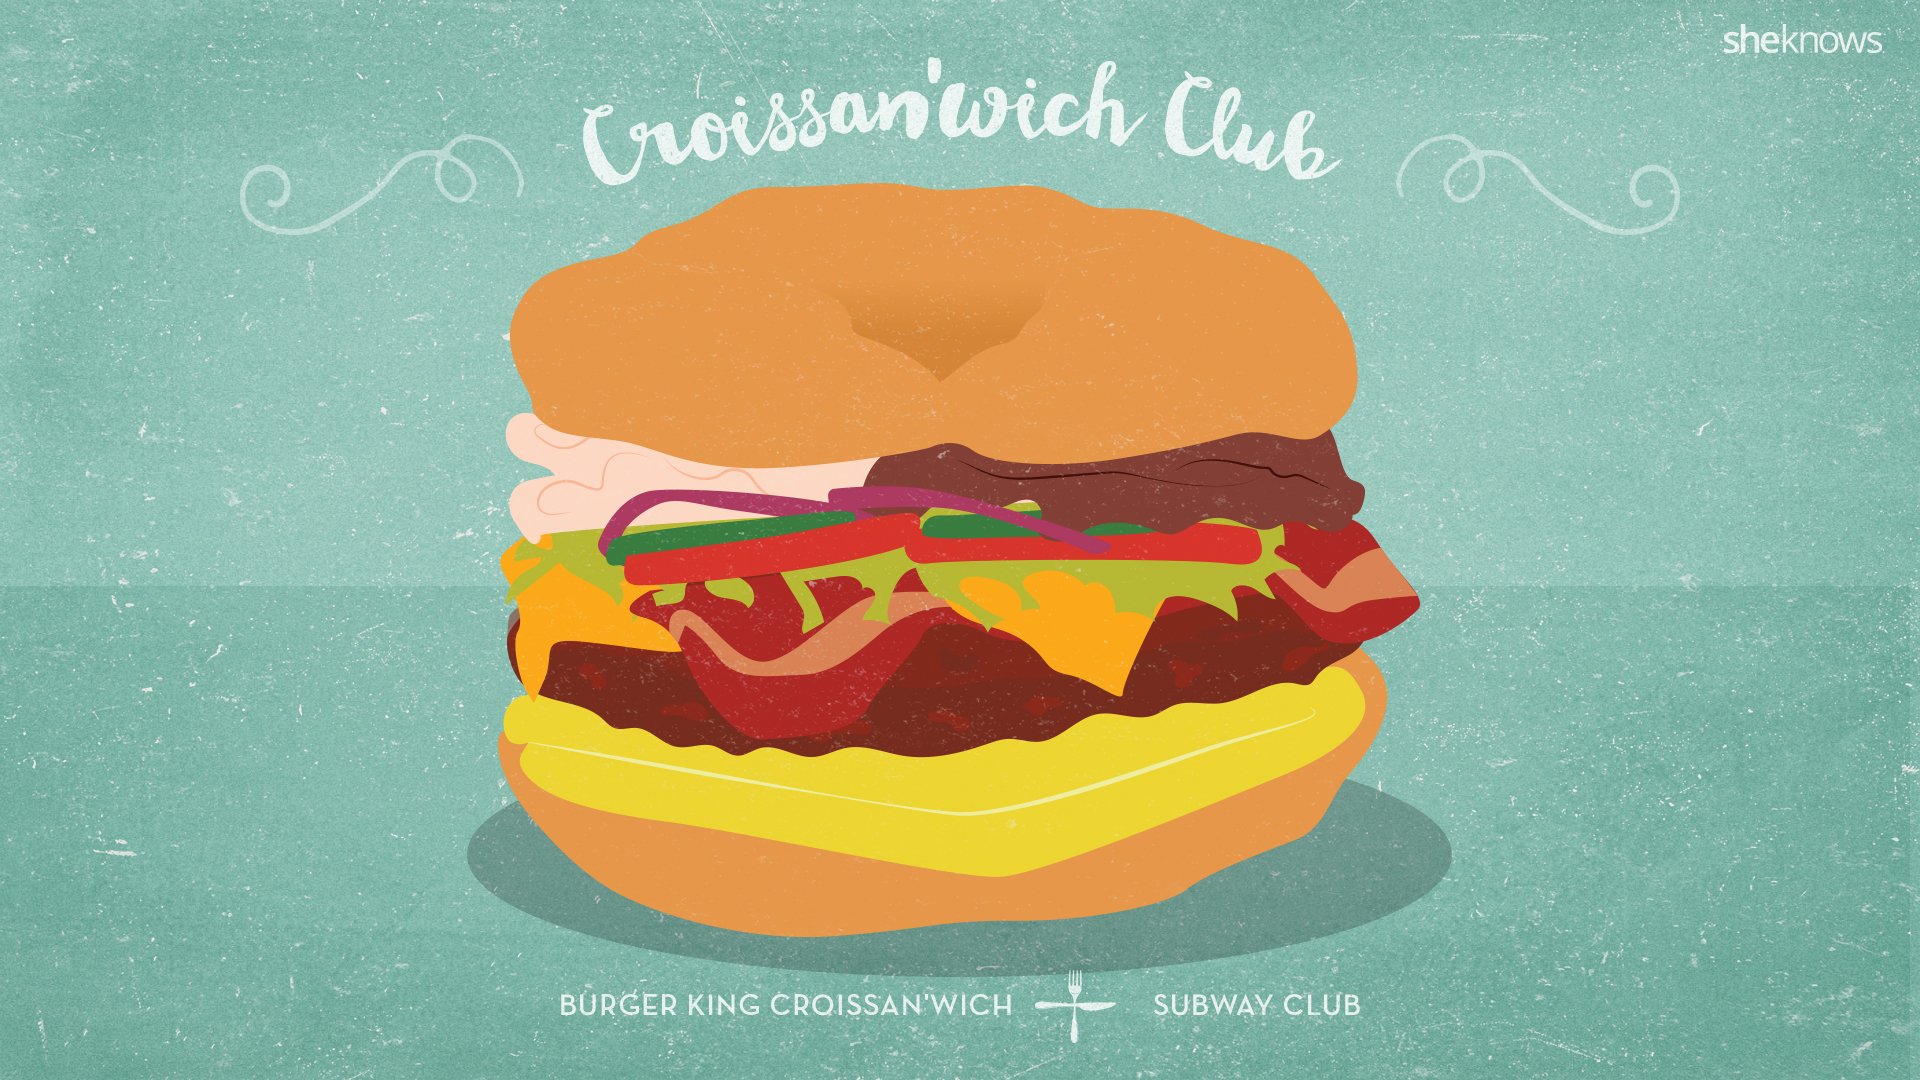 Croissan'wich Club